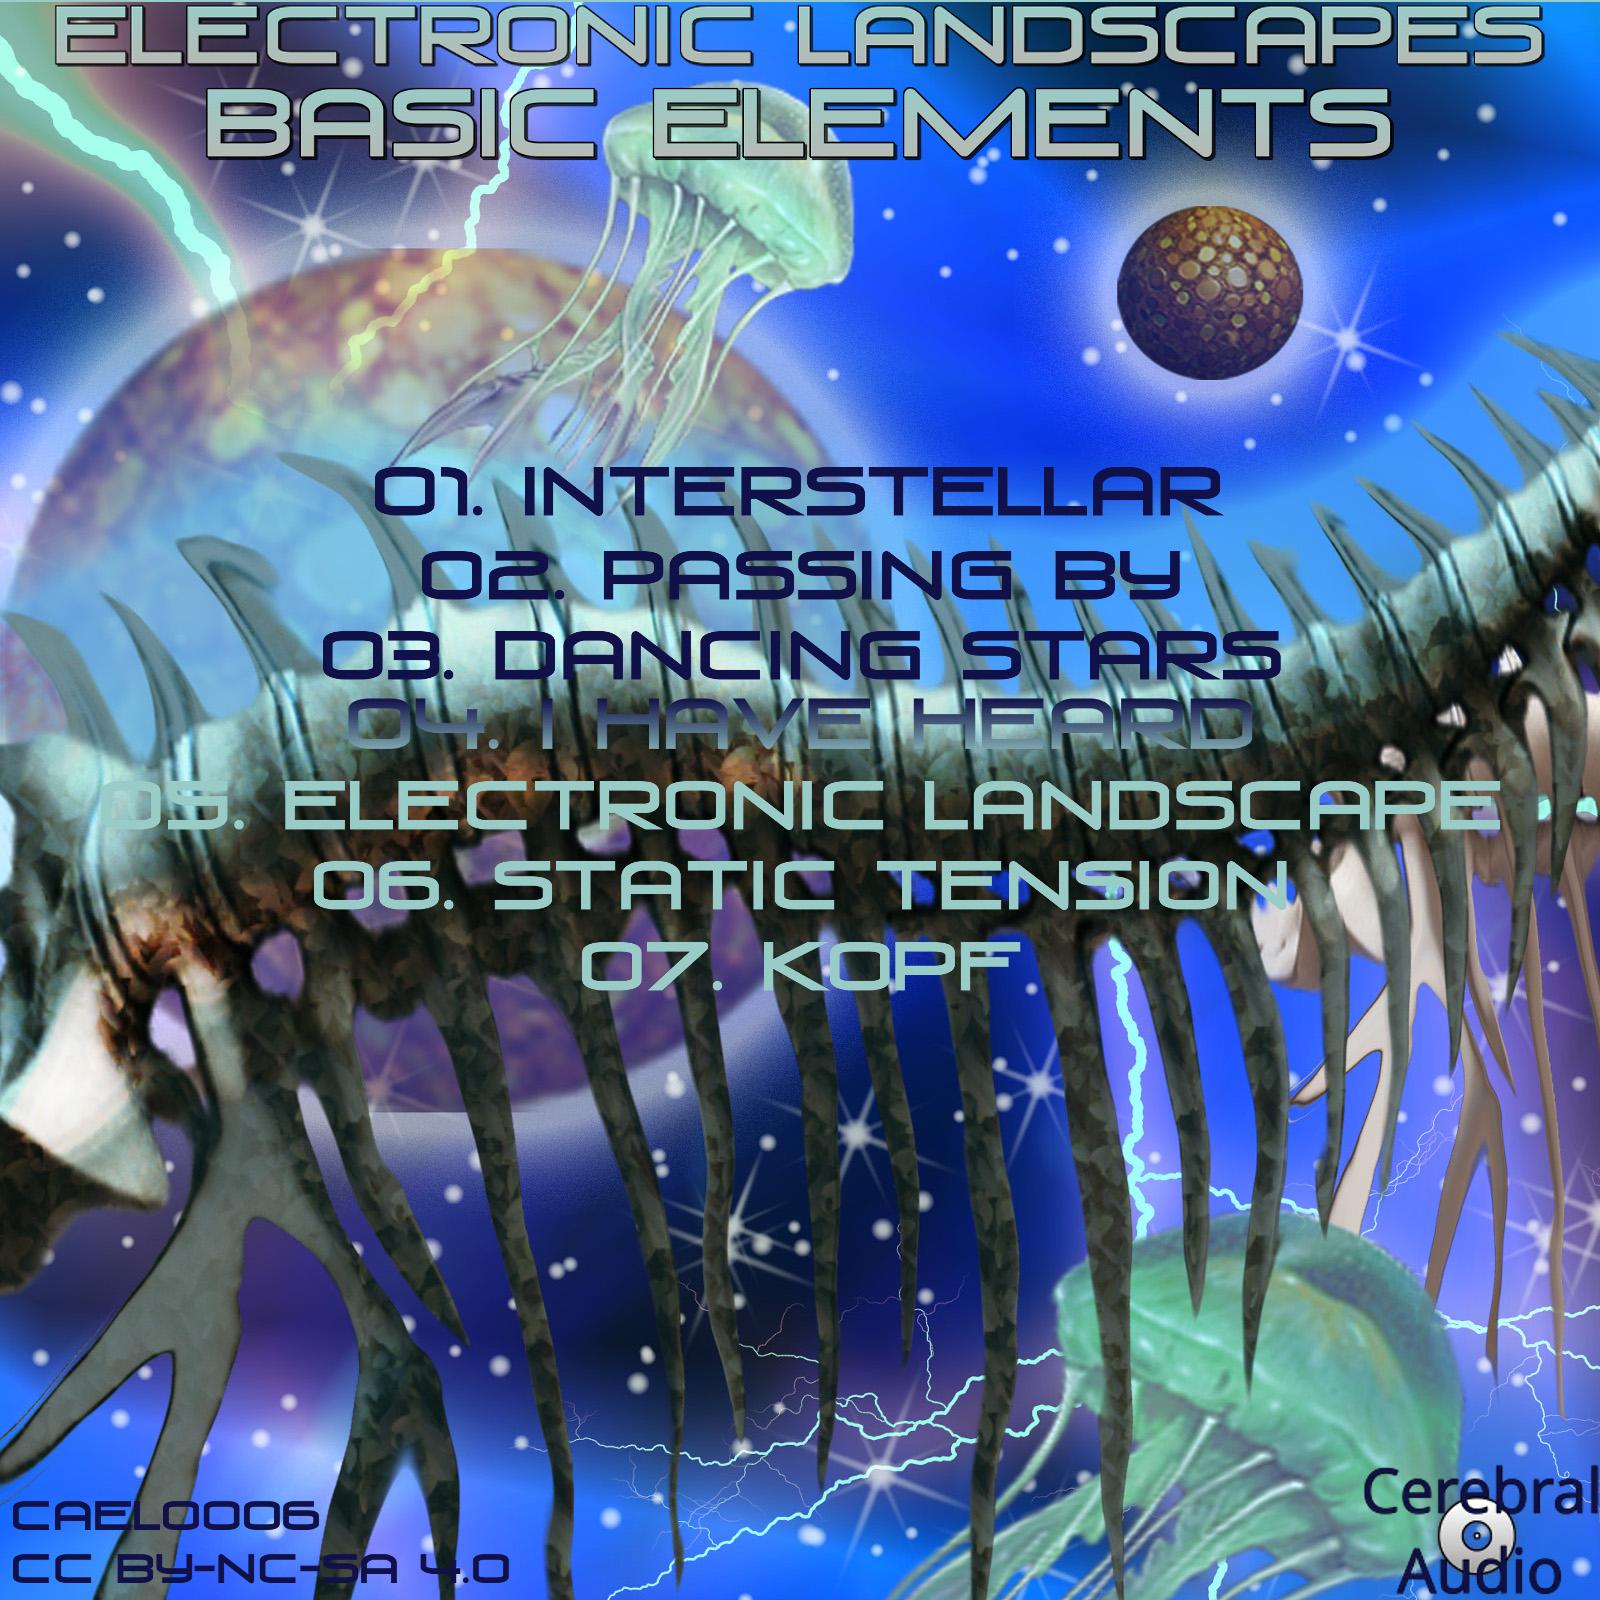 Electronic Landscapes